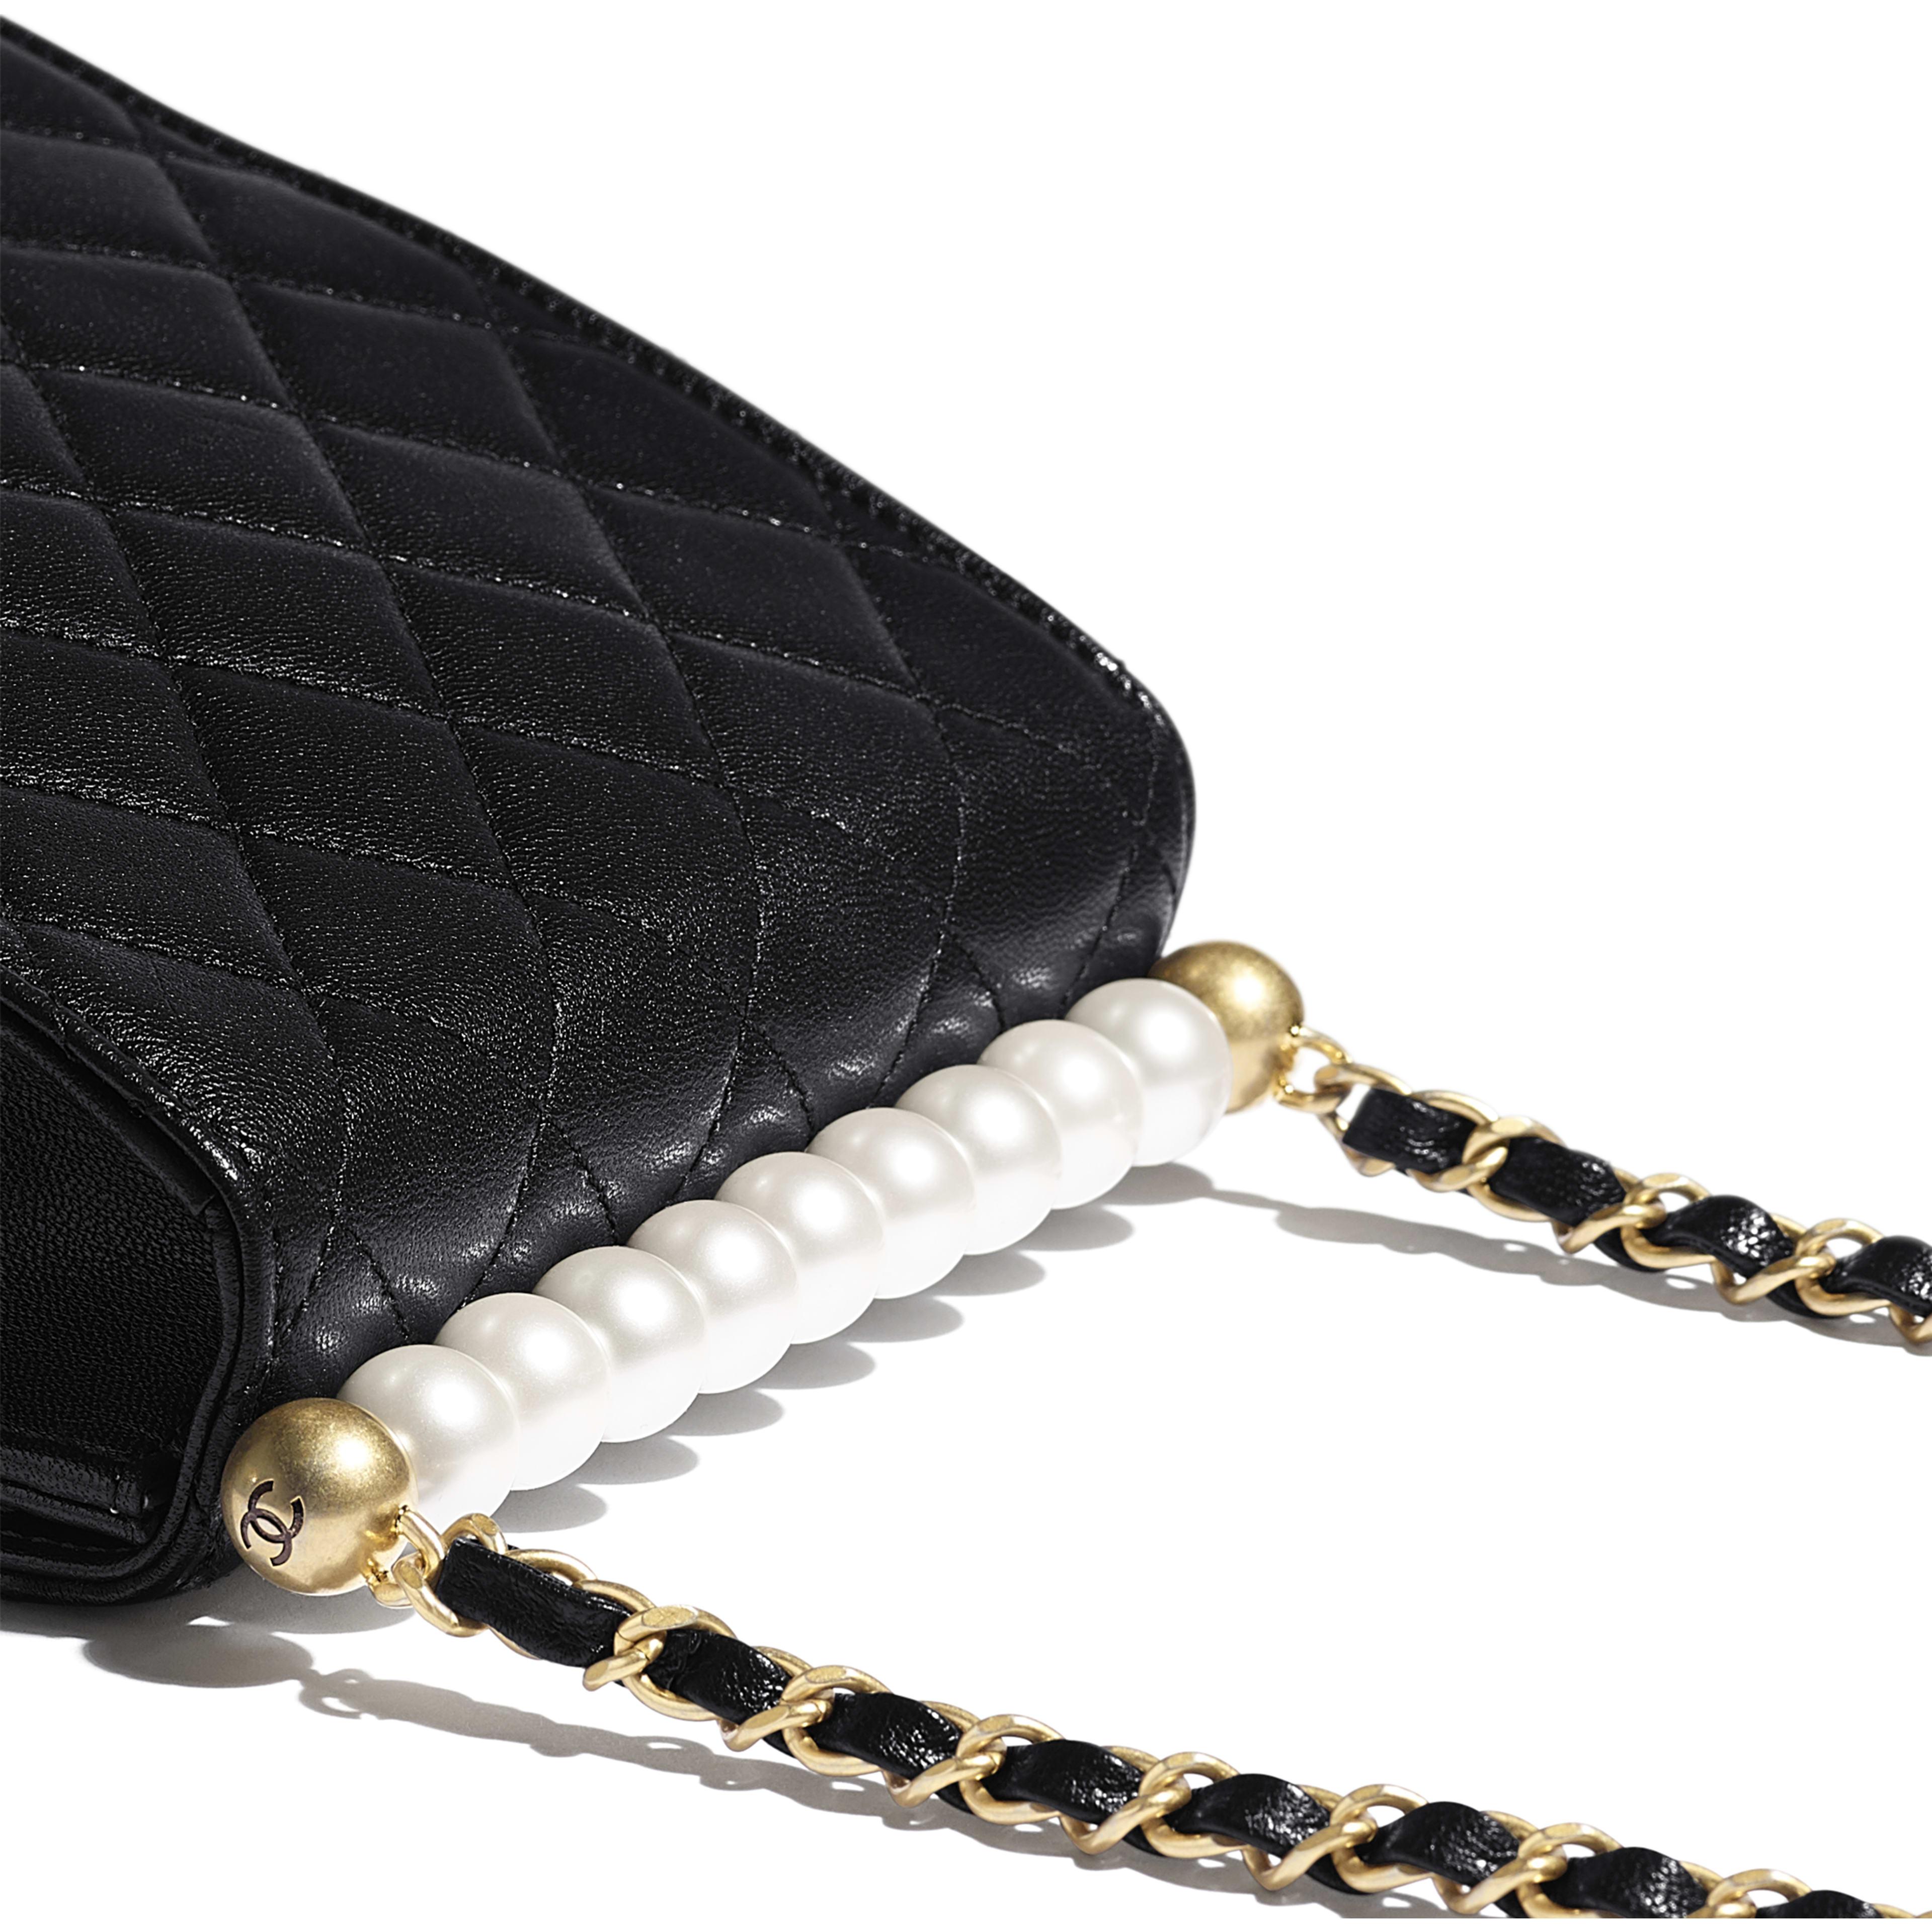 Flap Bag - Black - Goatskin, Imitation Pearls & Gold-Tone Metal - Extra view - see full sized version